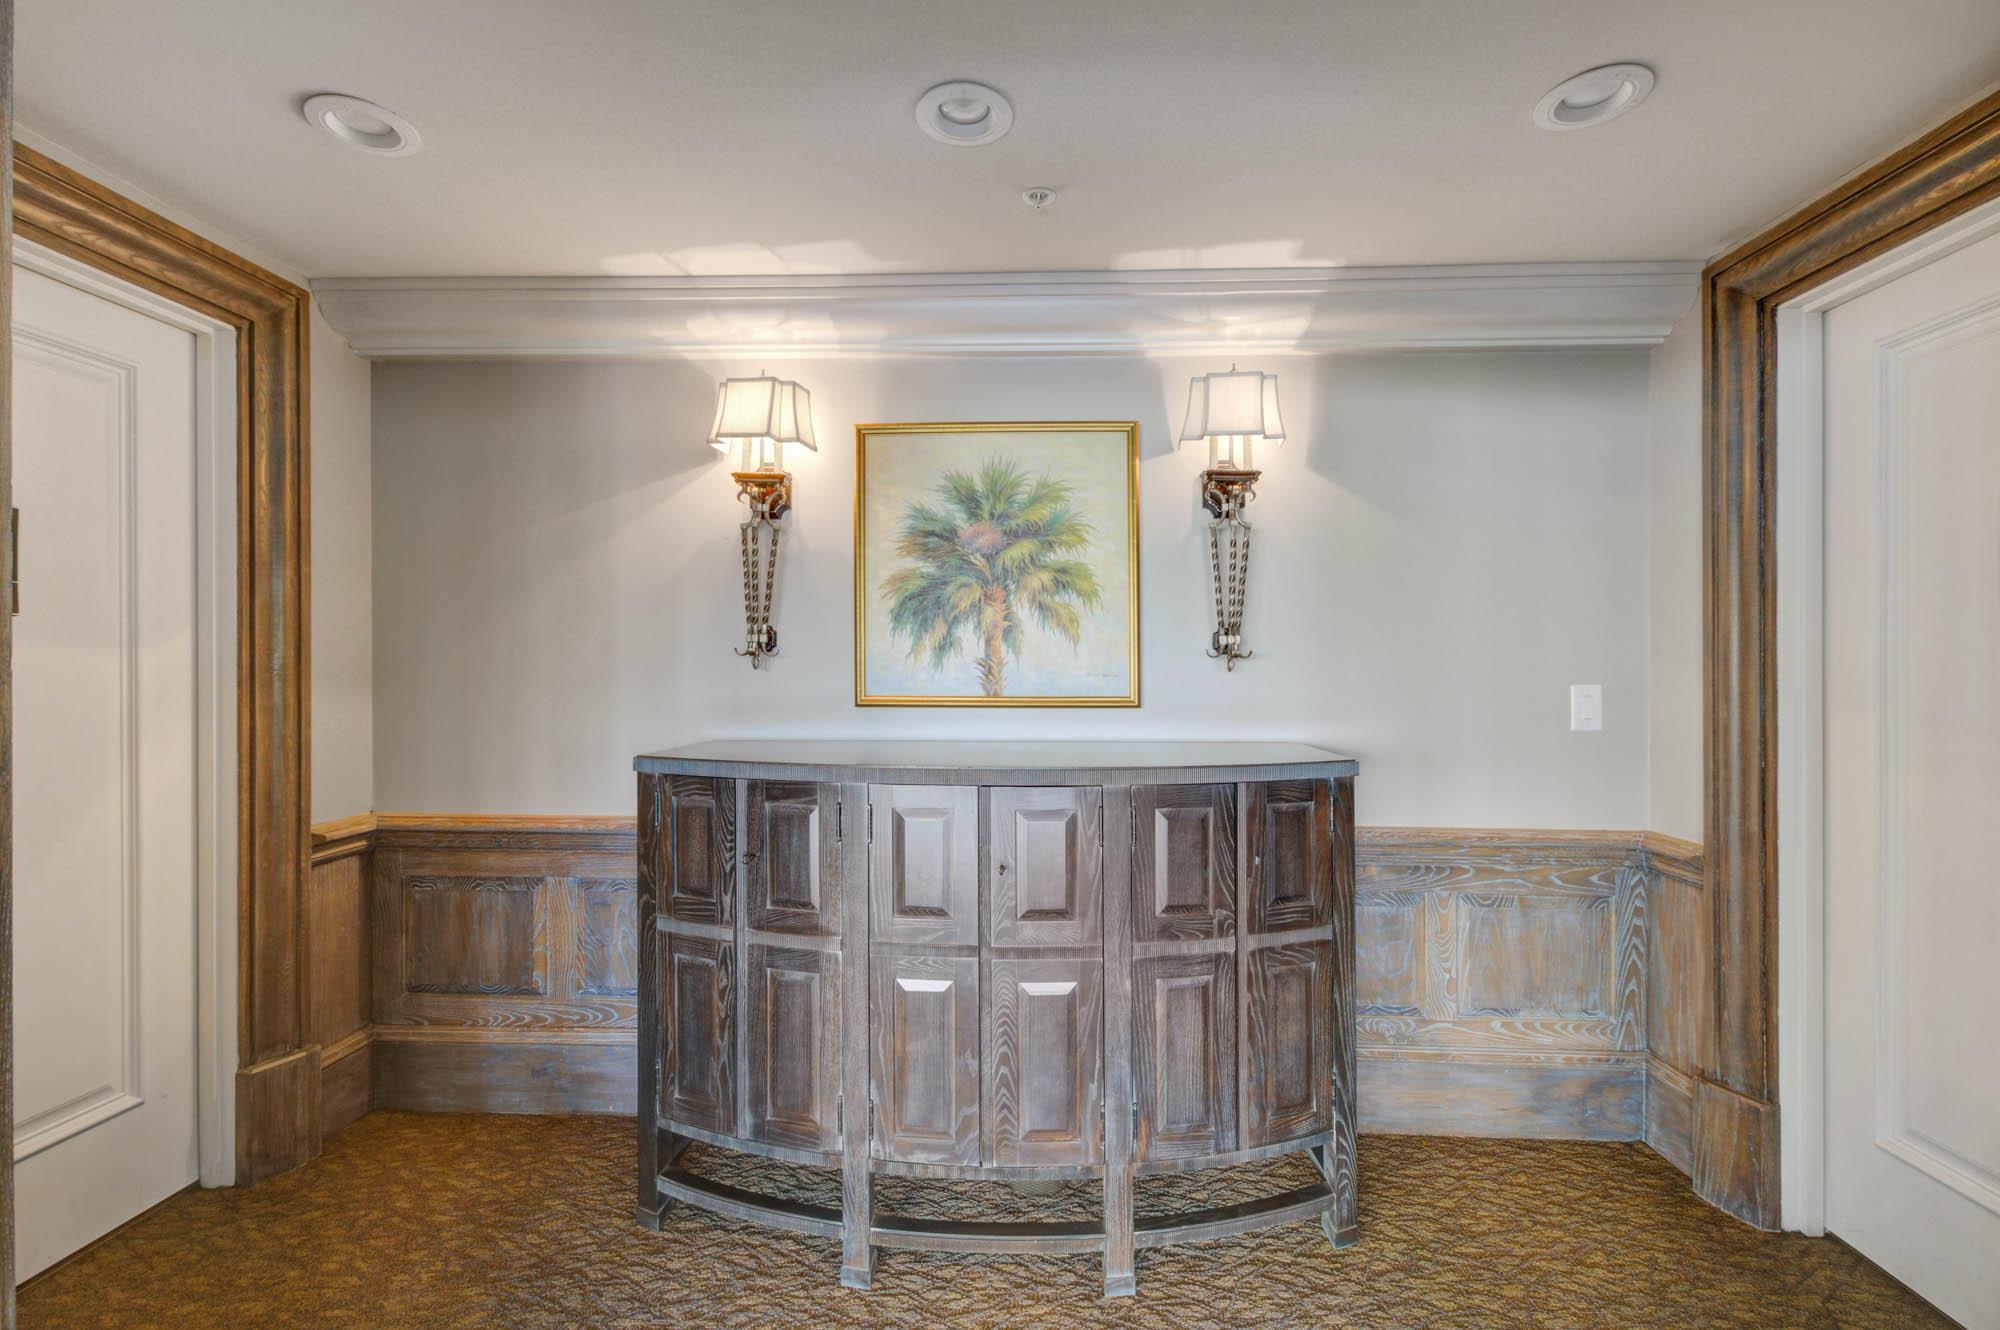 Renaissance On Chas Harbor Homes For Sale - 231 Plaza, Mount Pleasant, SC - 13